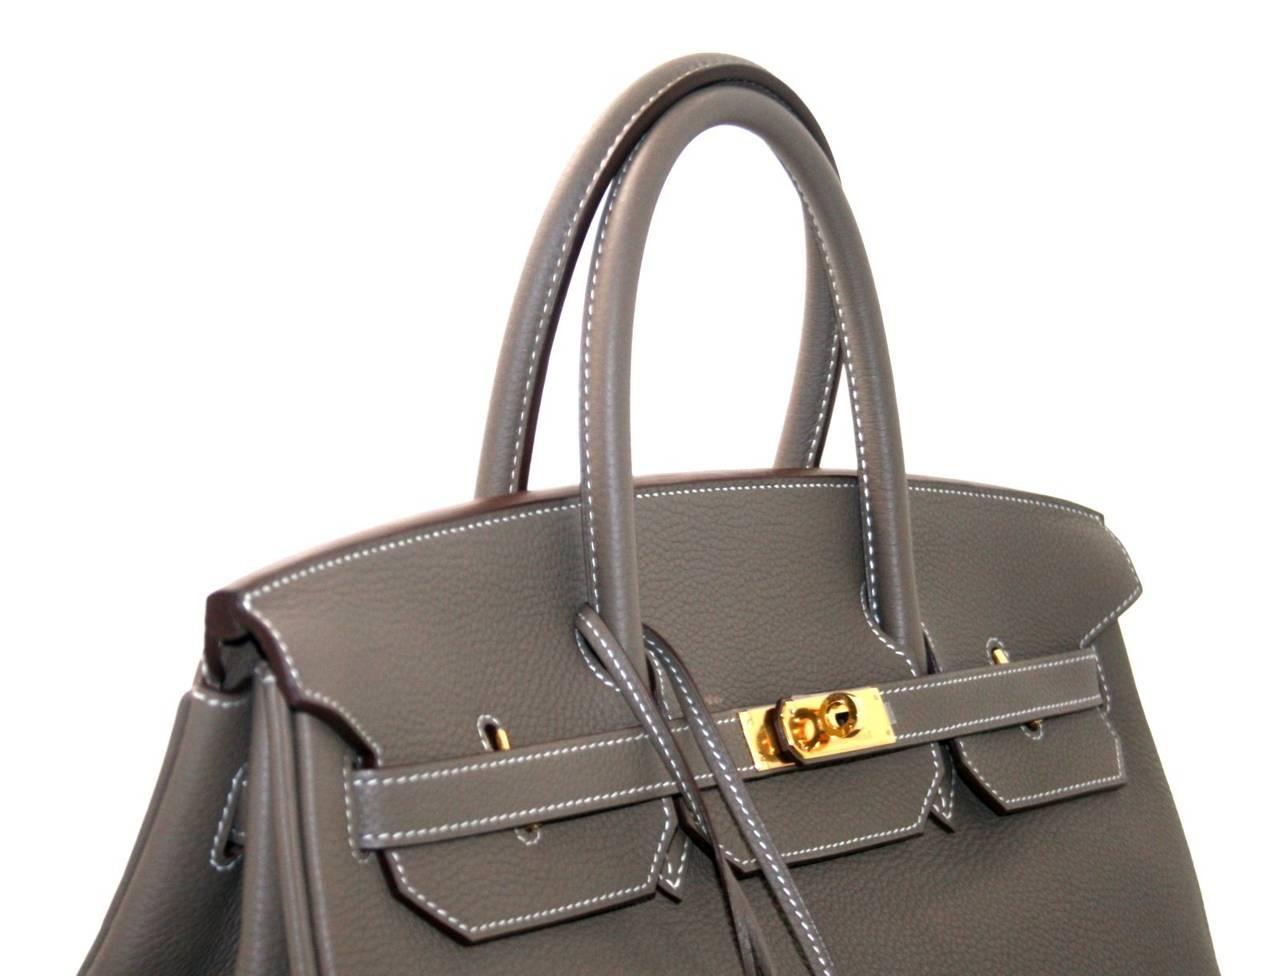 best hermes birkin color - Herm��s 40 cm Etoupe Togo Leather Birkin with Gold Hardware at 1stdibs